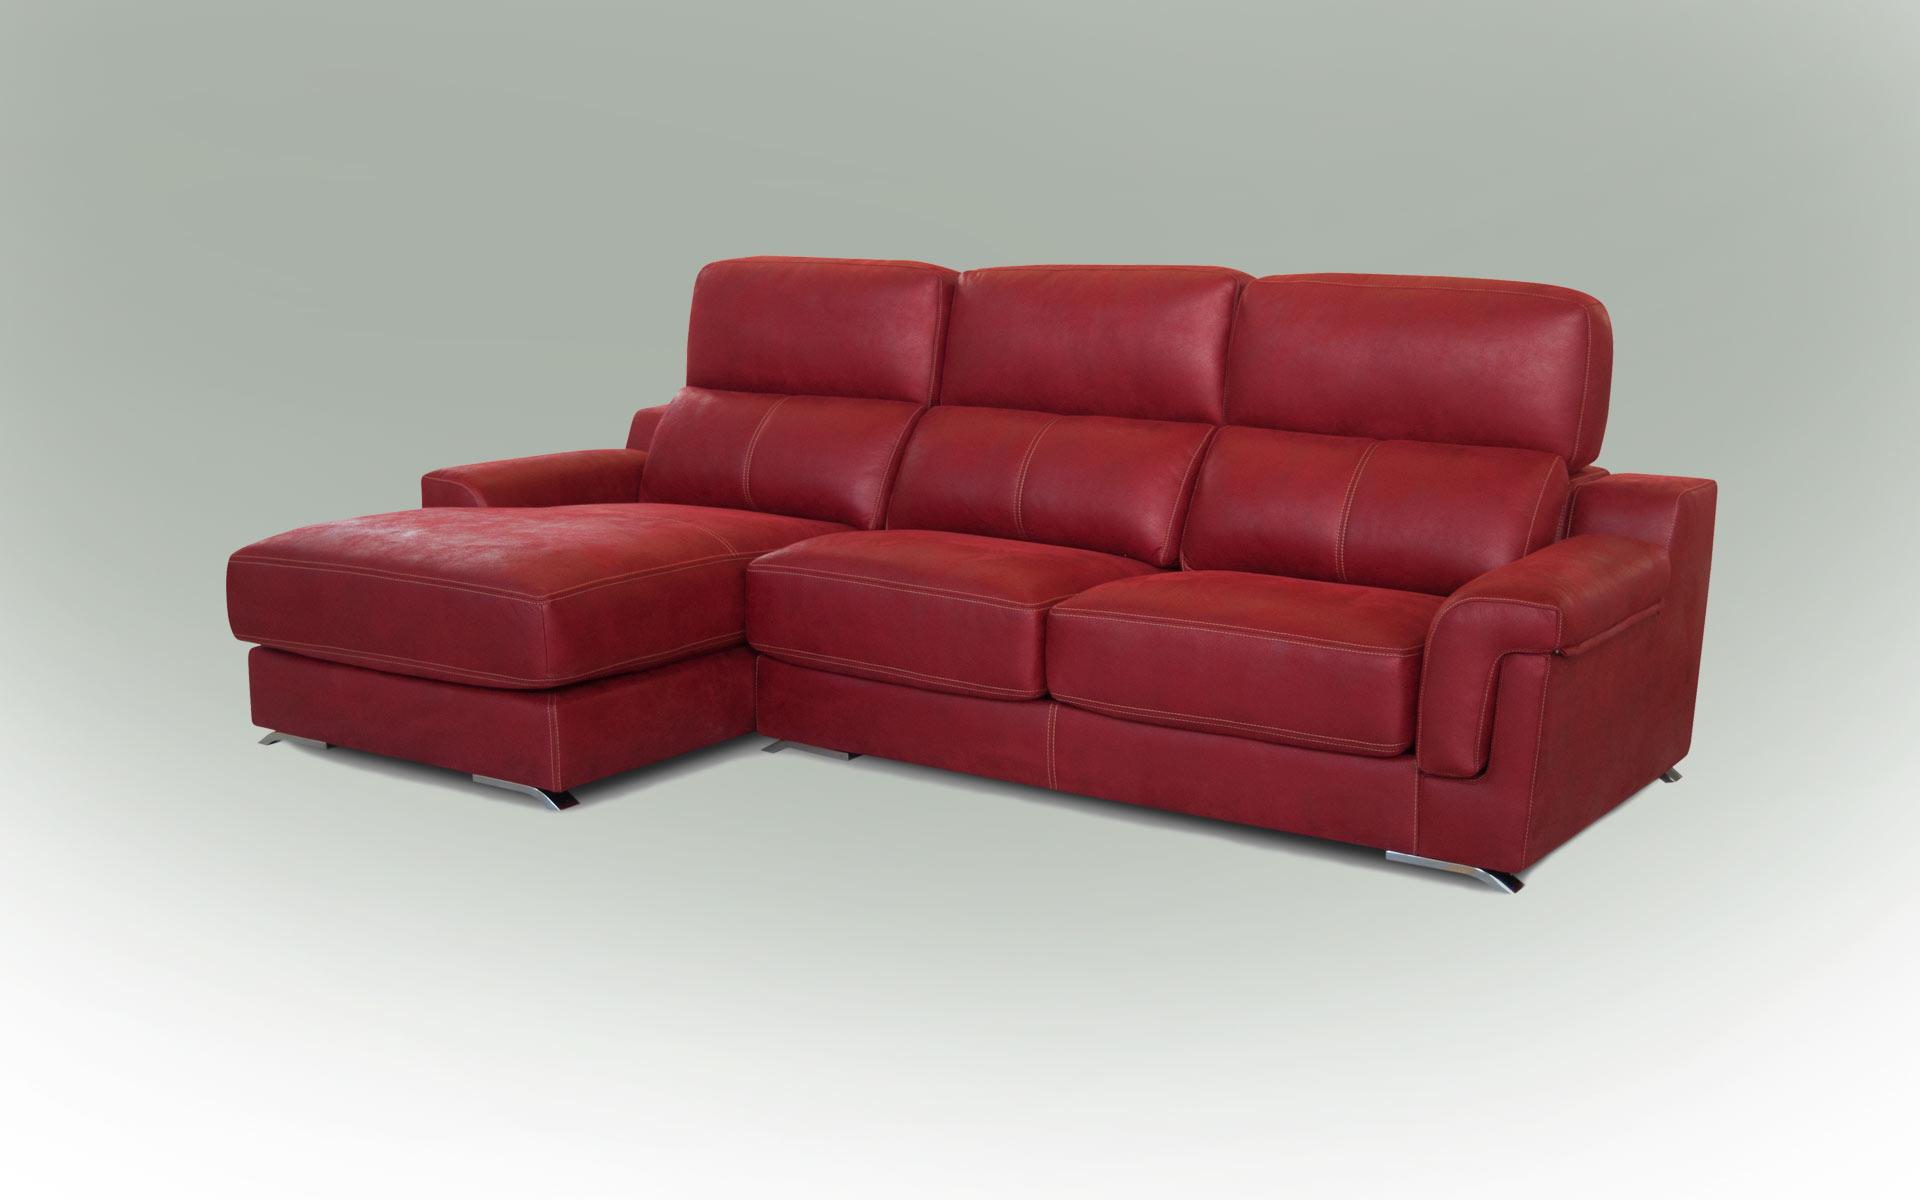 Sofas baratos en asturias good sofas muy baratos en for Muebles mato gijon